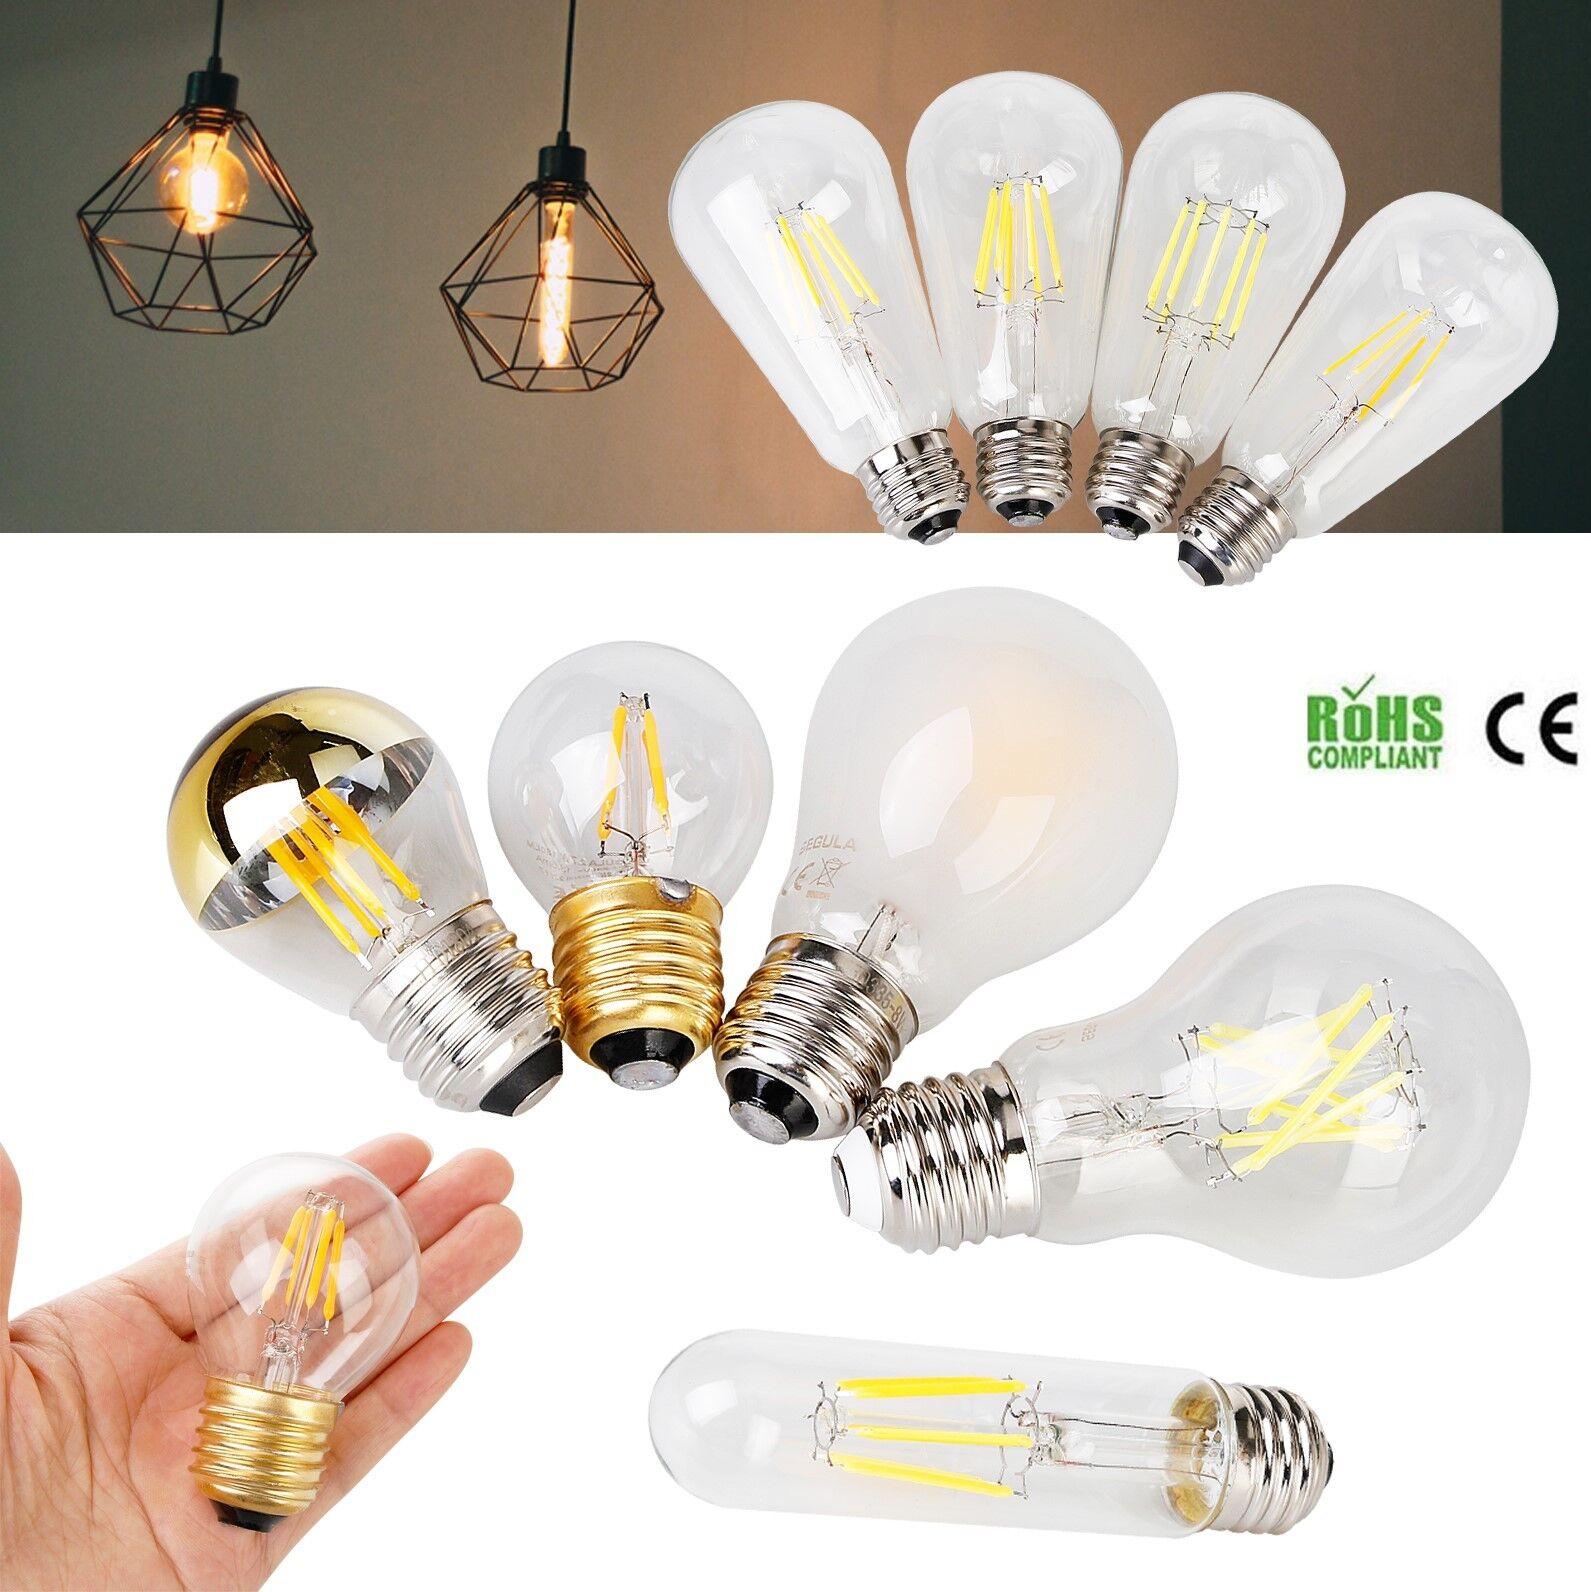 Al por mayor 20x Edison Bombillas Led Luz Vintage Regulable E26 E27 E12 E14 6 W 8 W 10 W